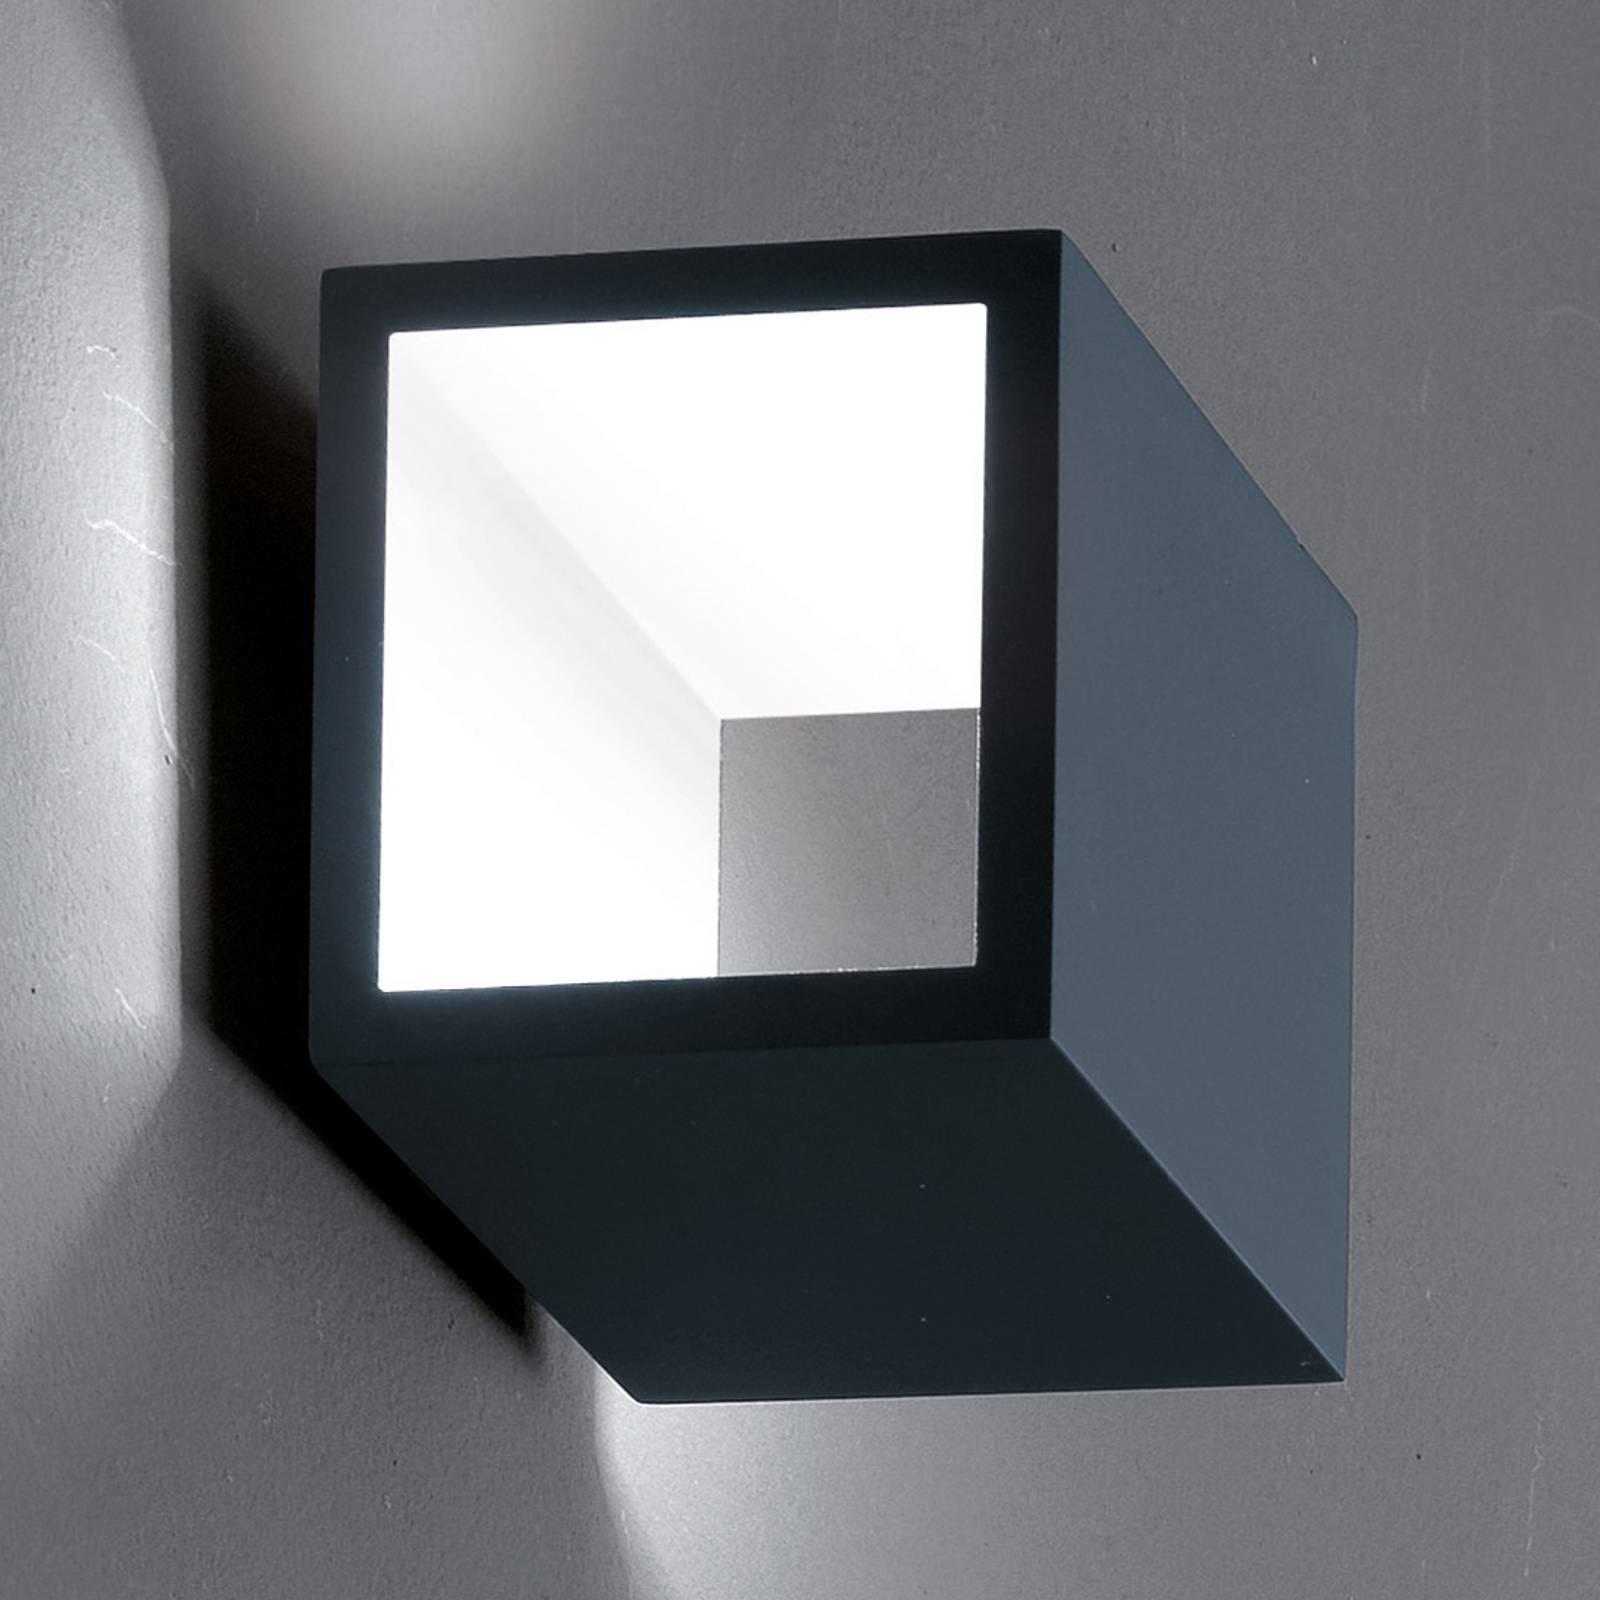 ICONE Cubò LED-Wandleuchte, 10 W, titan/weiß